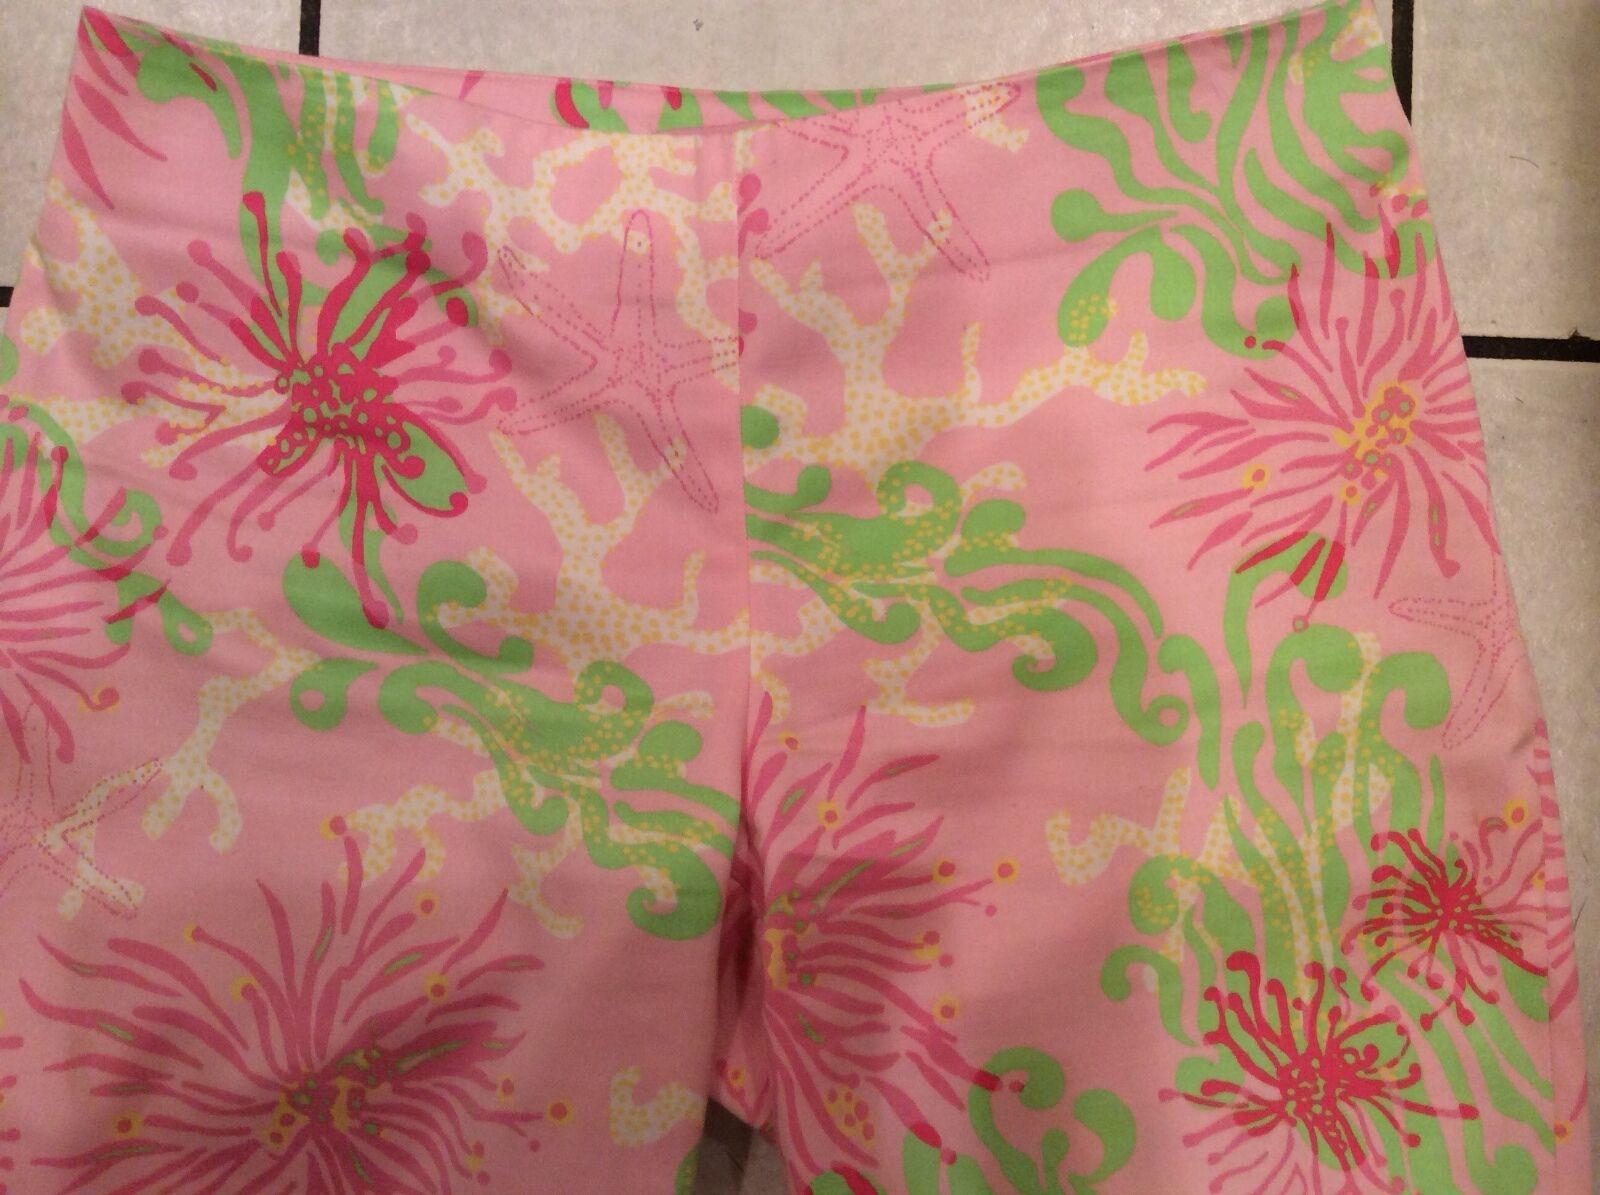 Lilly Pulitzer Resort Bermuda Shorts 2 Pink Green Starfish floral MINT ADORABLE